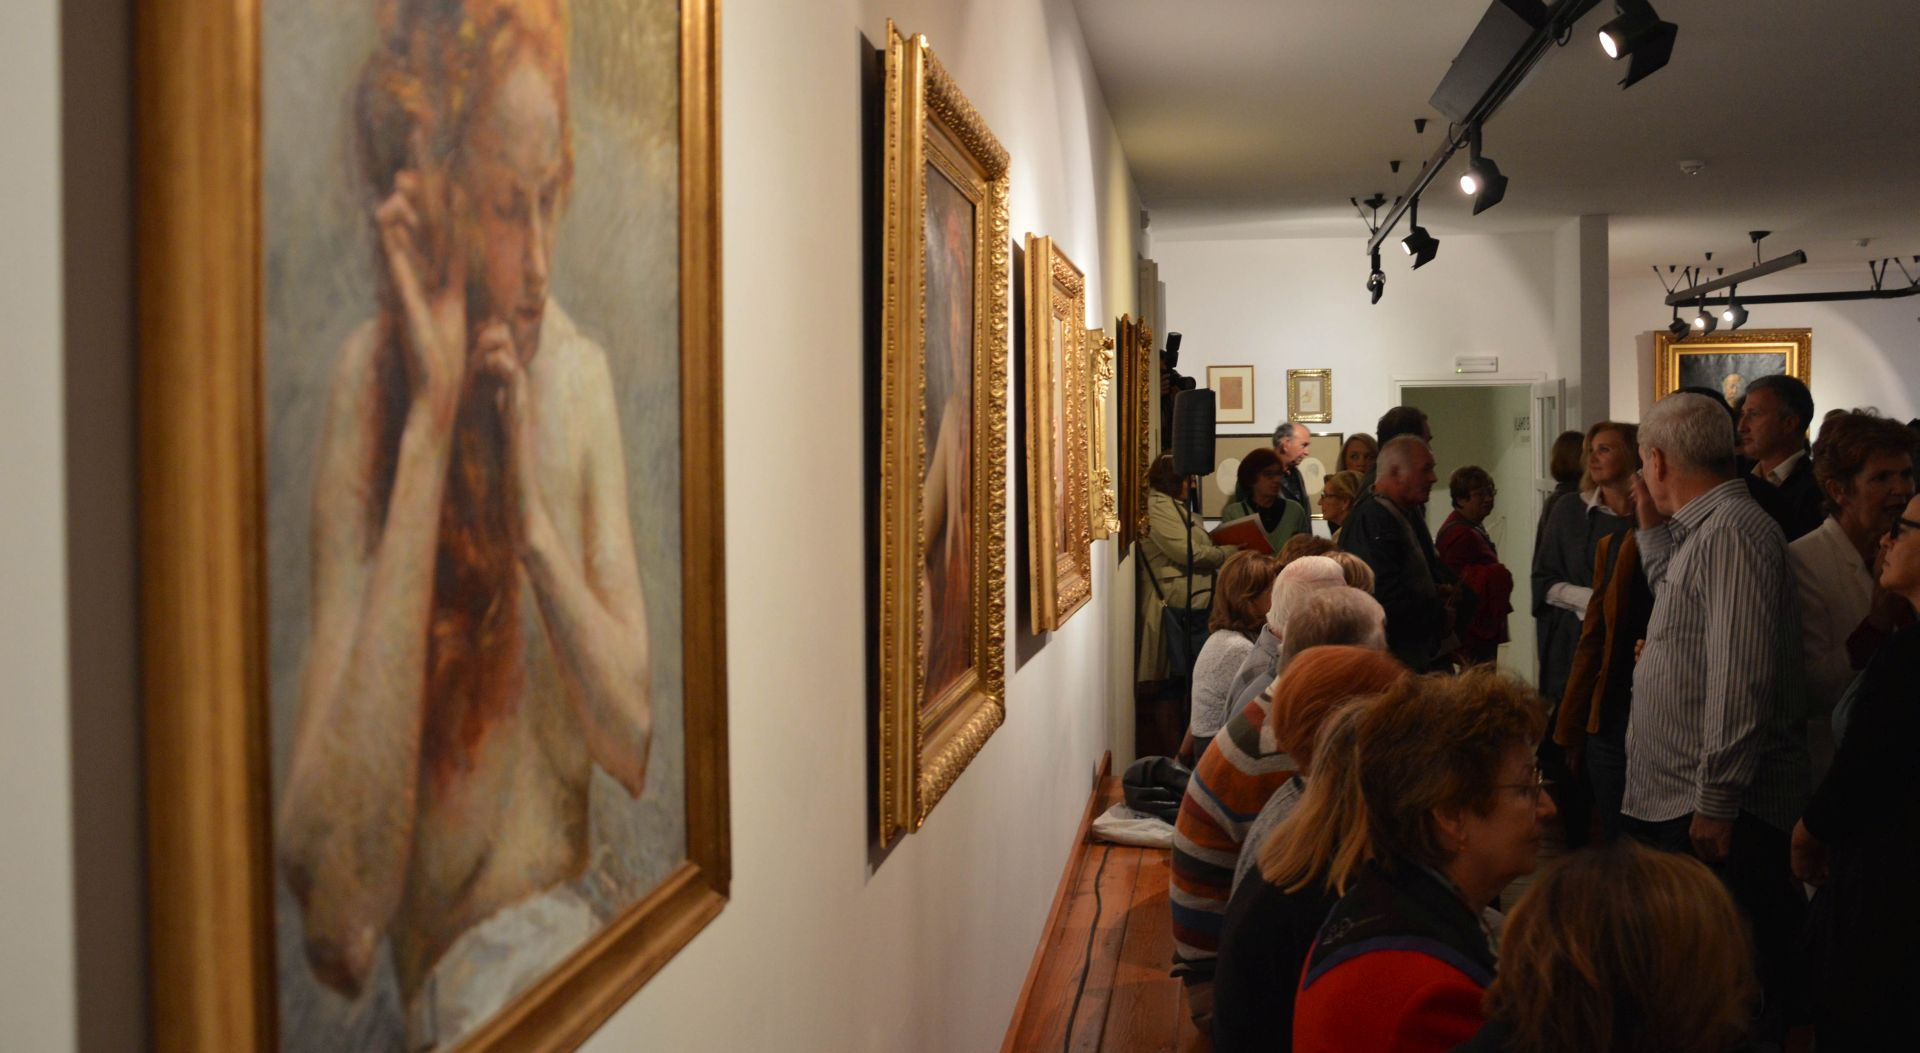 Dubrovnik: Otvorena izložba slika V. Bukovca iz privatnih zbirki